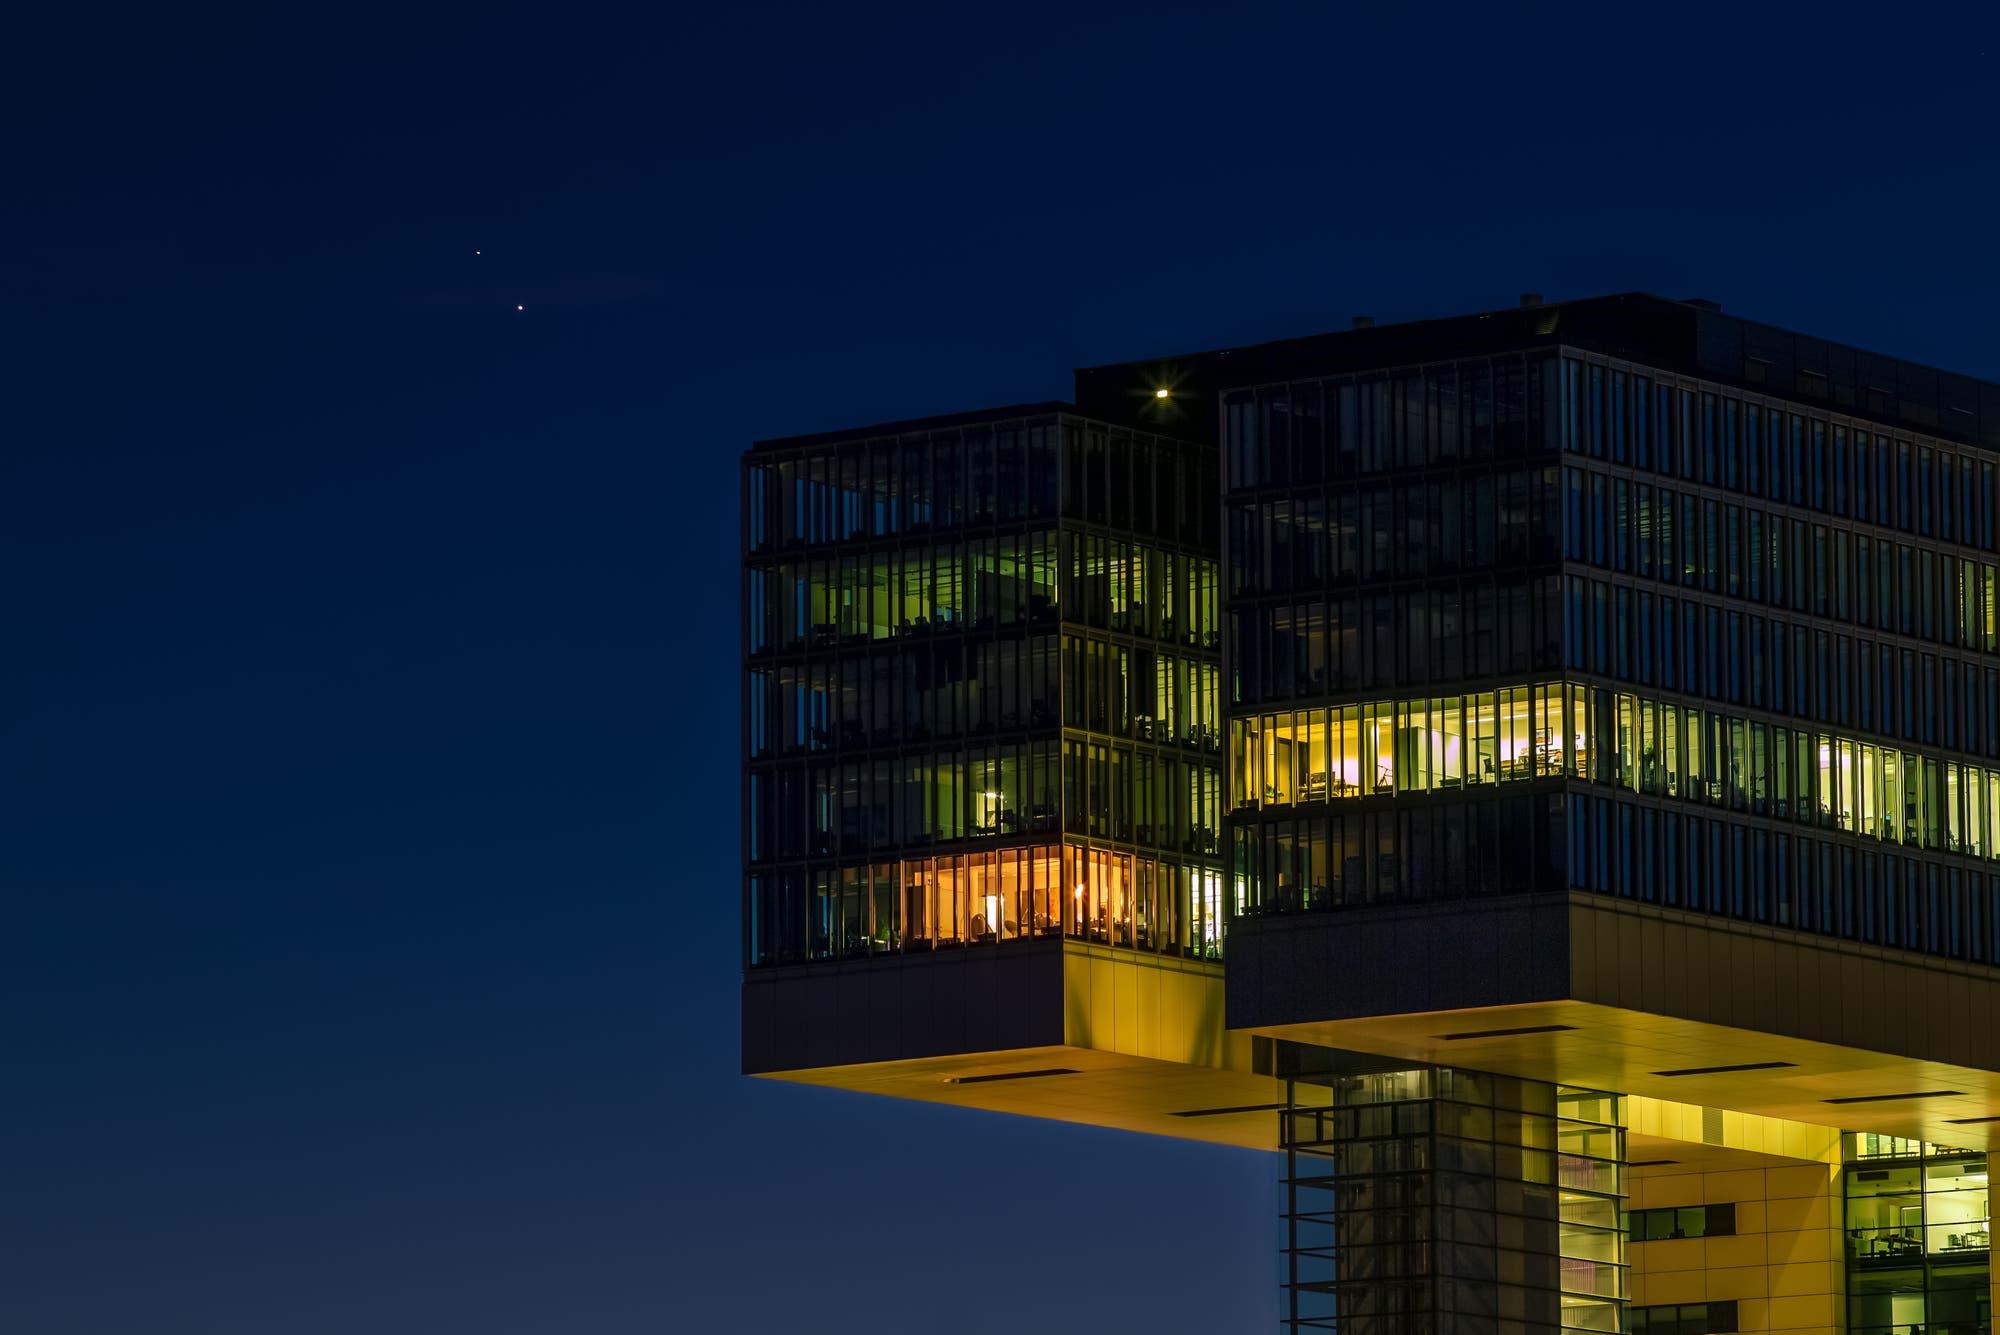 Kranhäuser in Köln mit Planeten